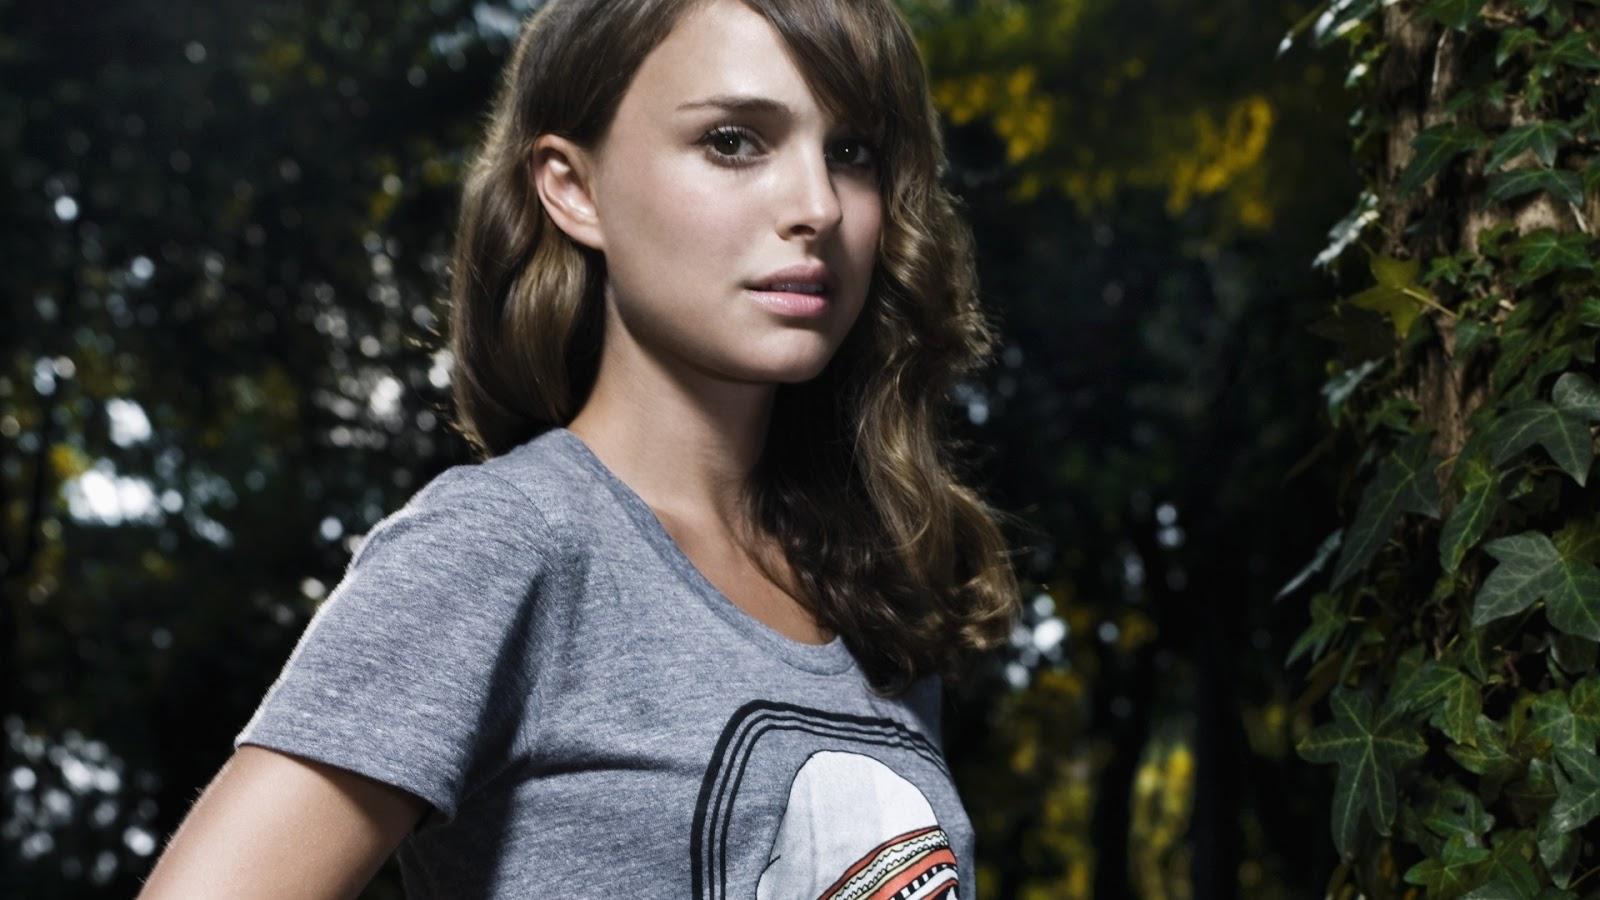 Natalie Portman Beautiful Image